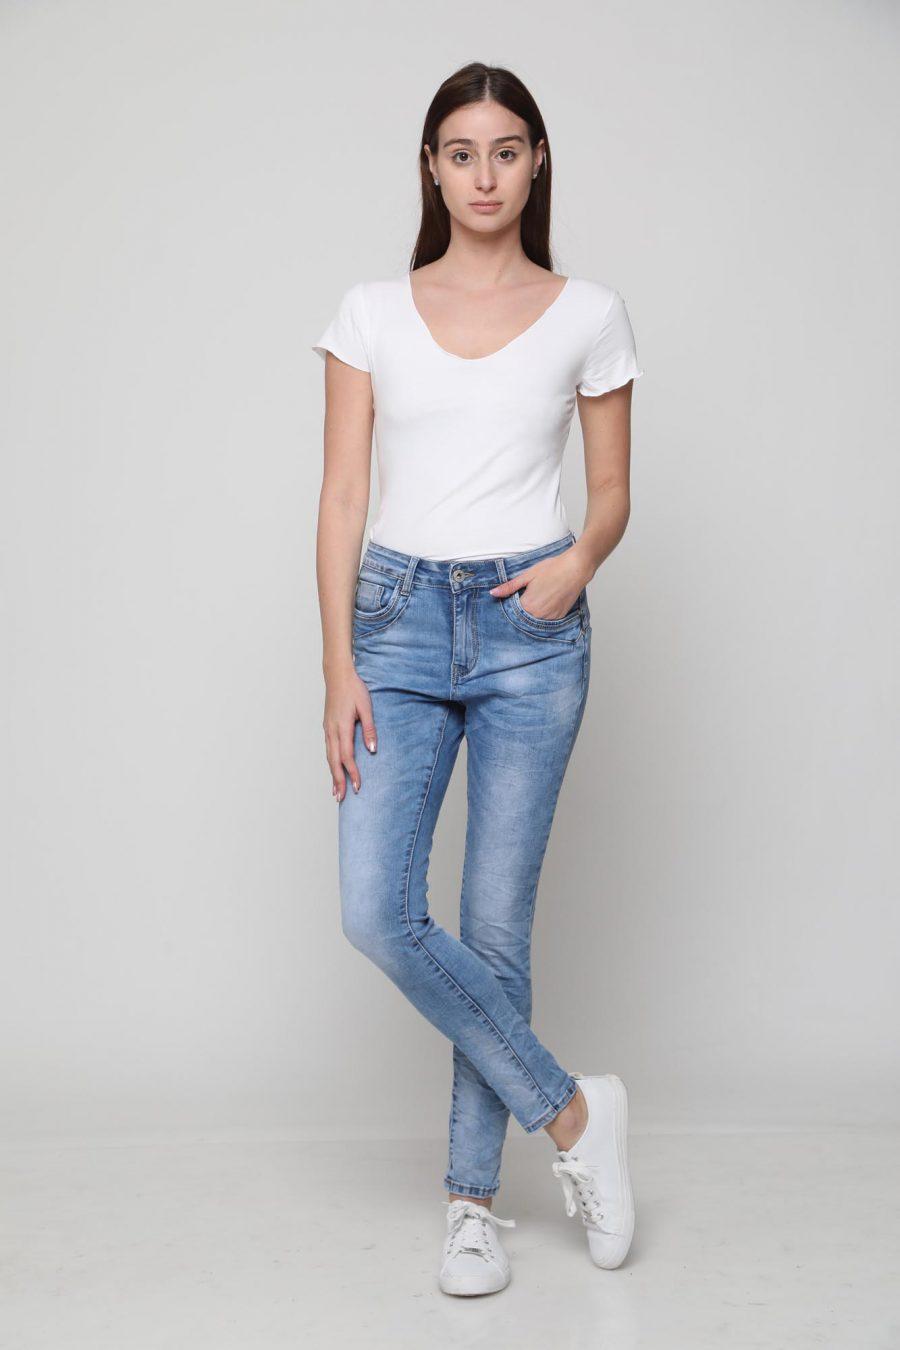 ג'ינס ברצלונה